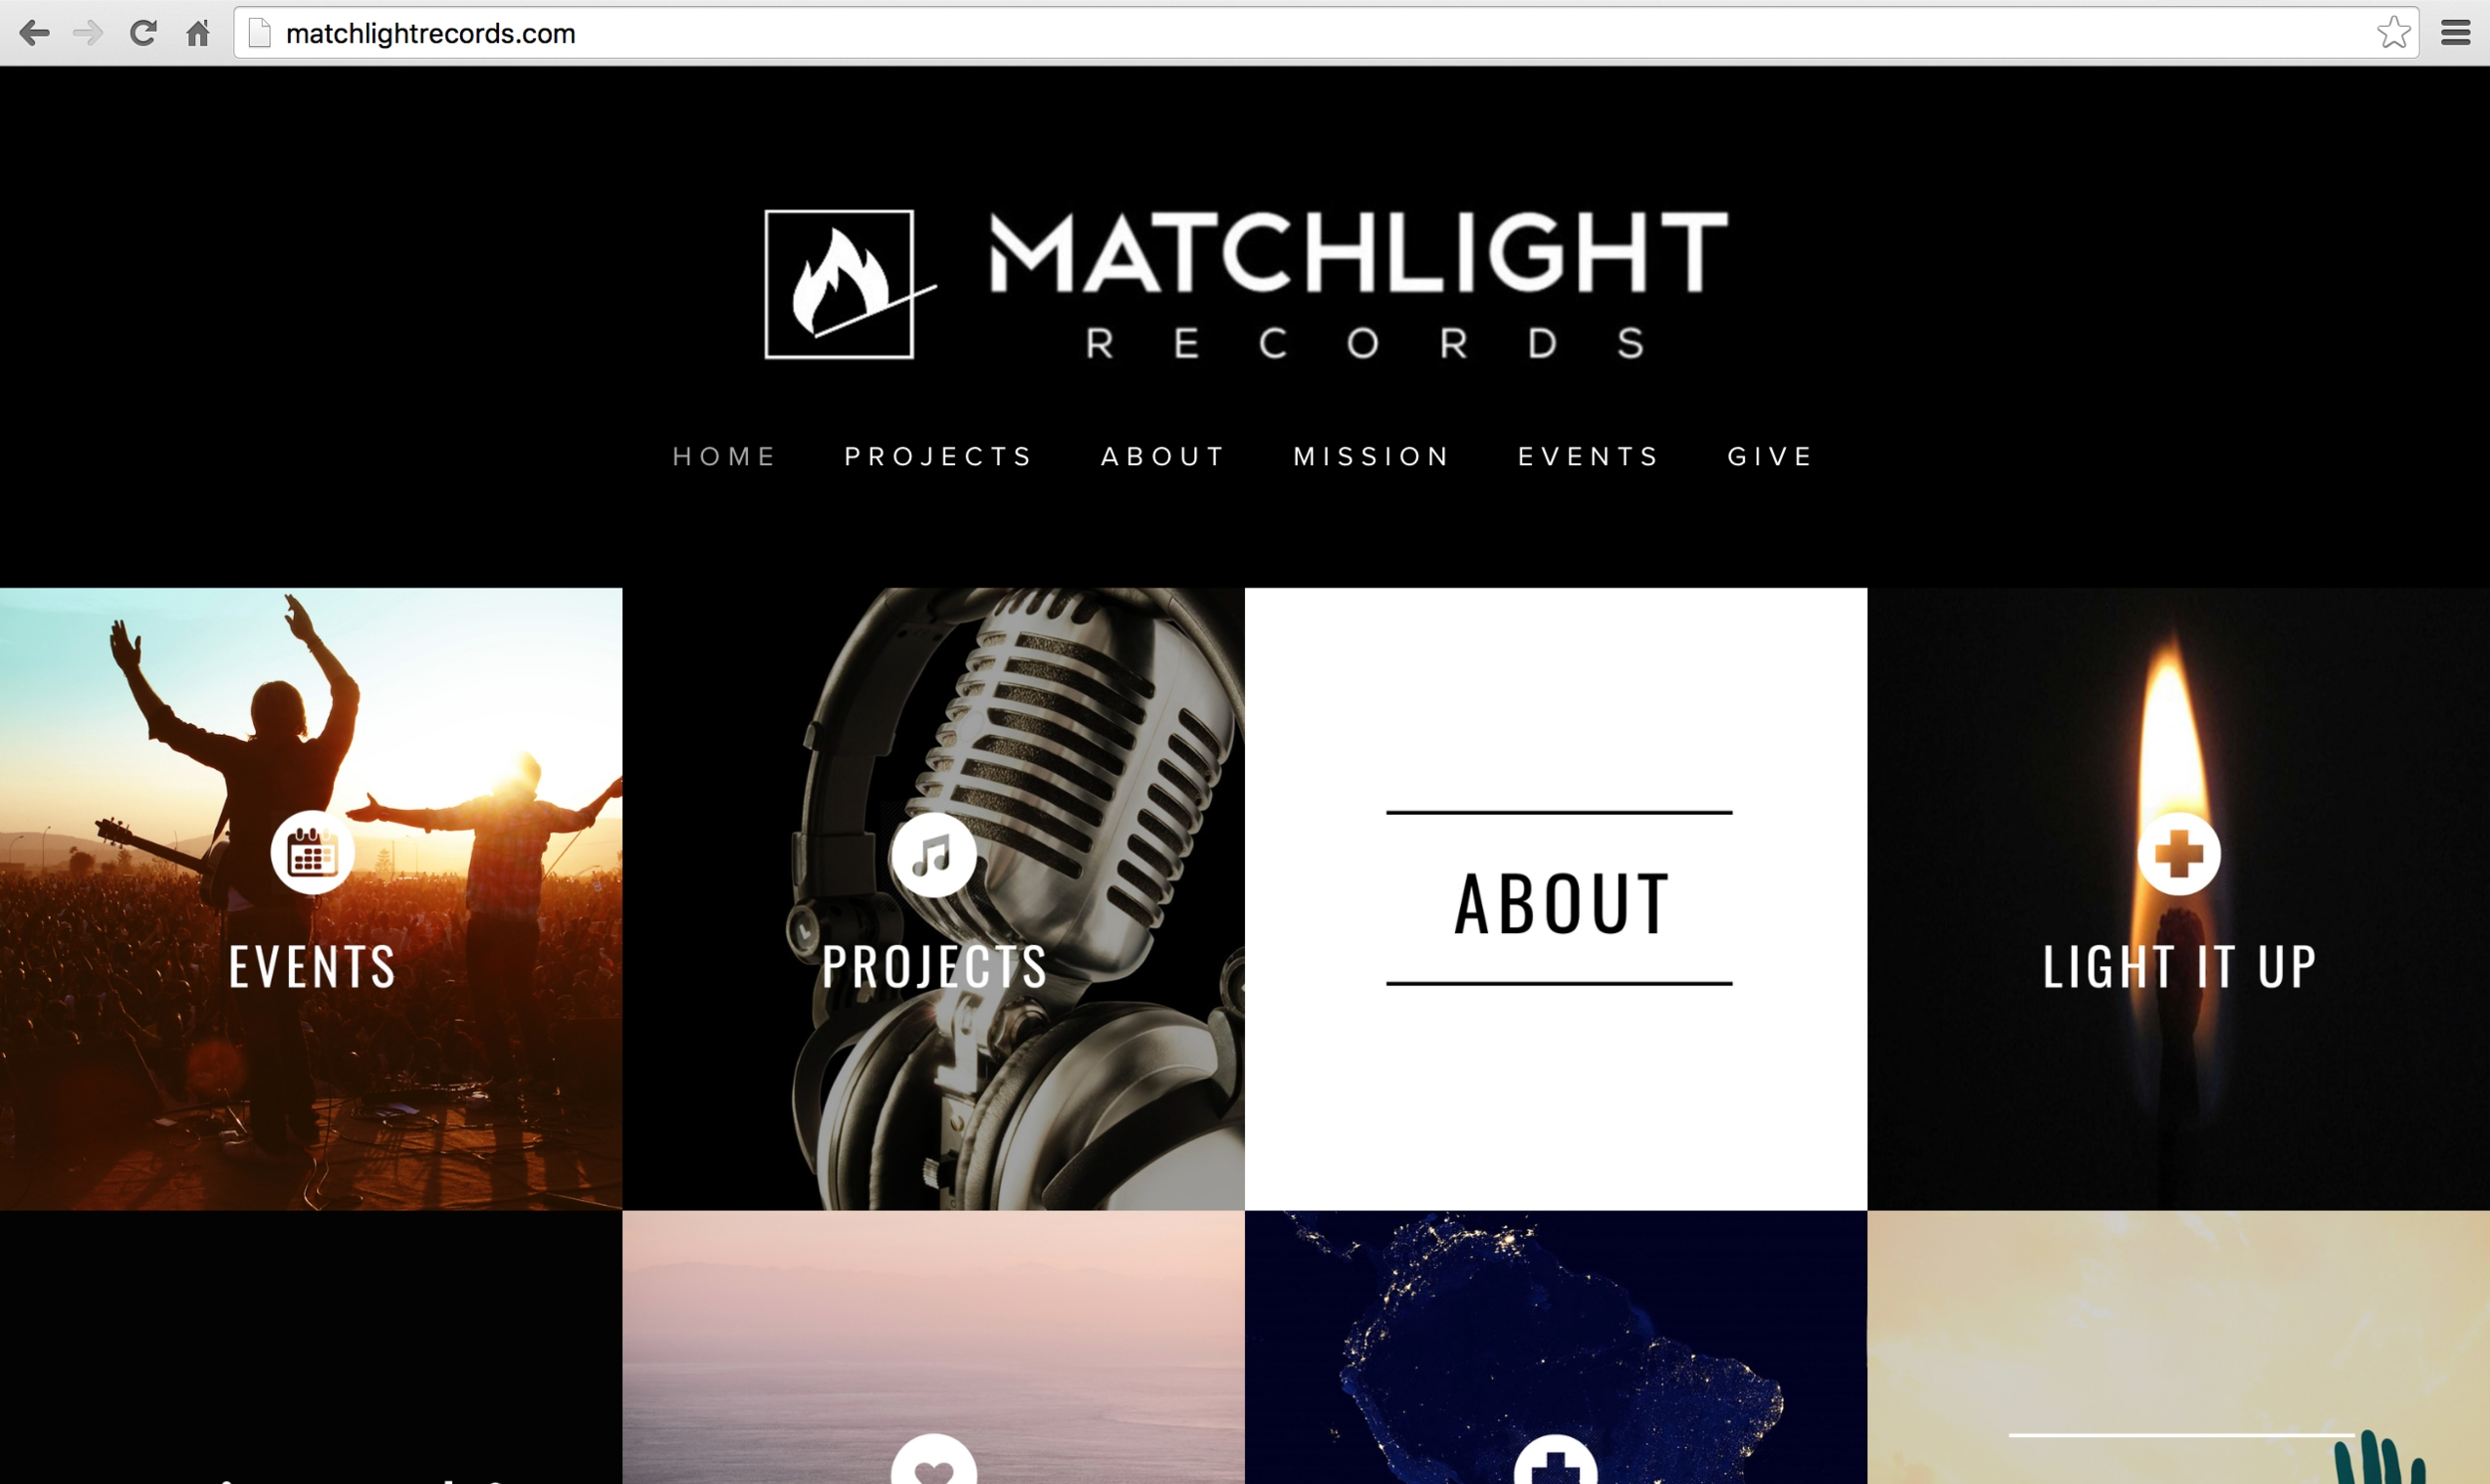 MATCHLIGHT RECORDS WEBSITE